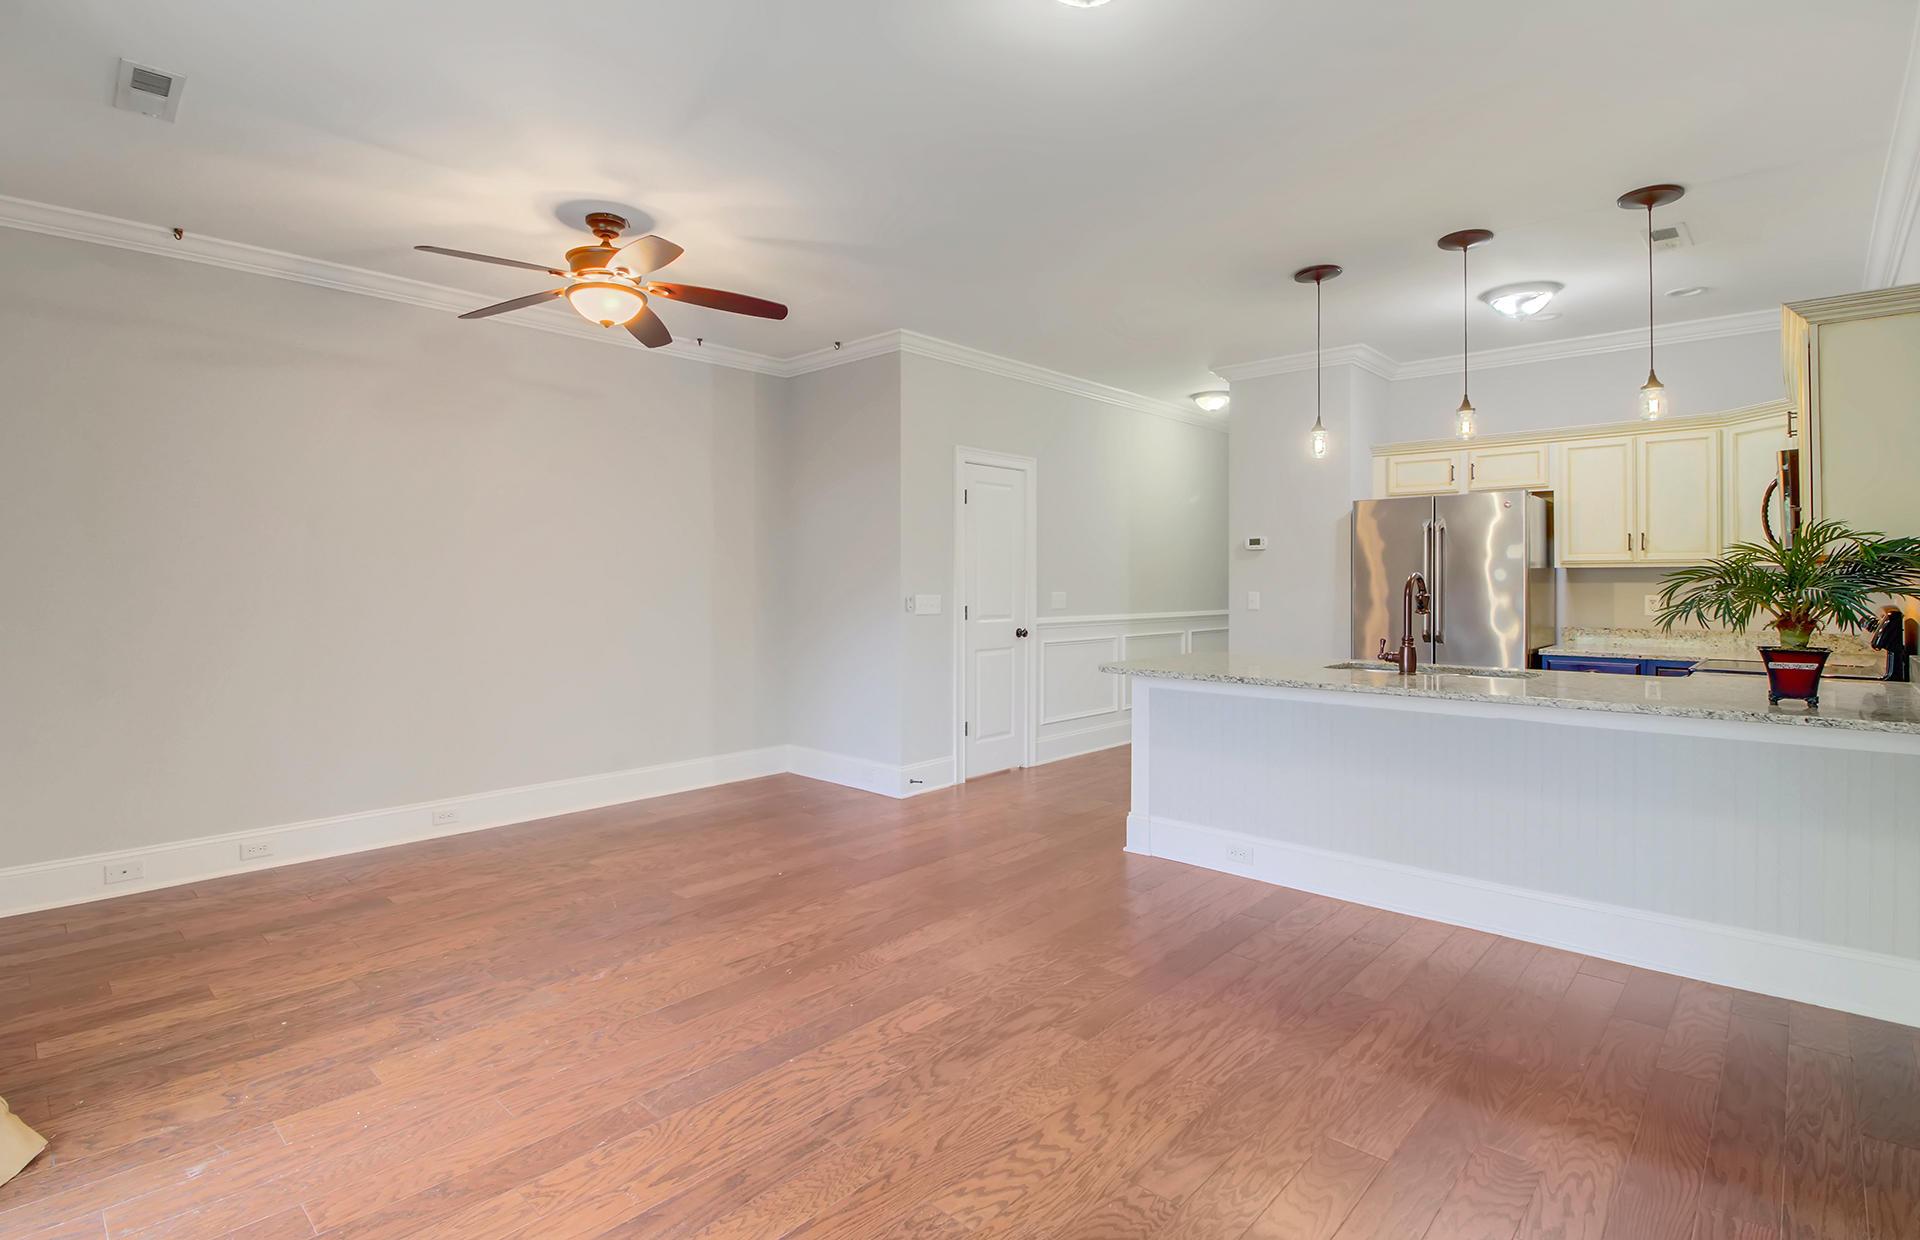 Carol Oaks Town Homes Homes For Sale - 2960 Emma, Mount Pleasant, SC - 7